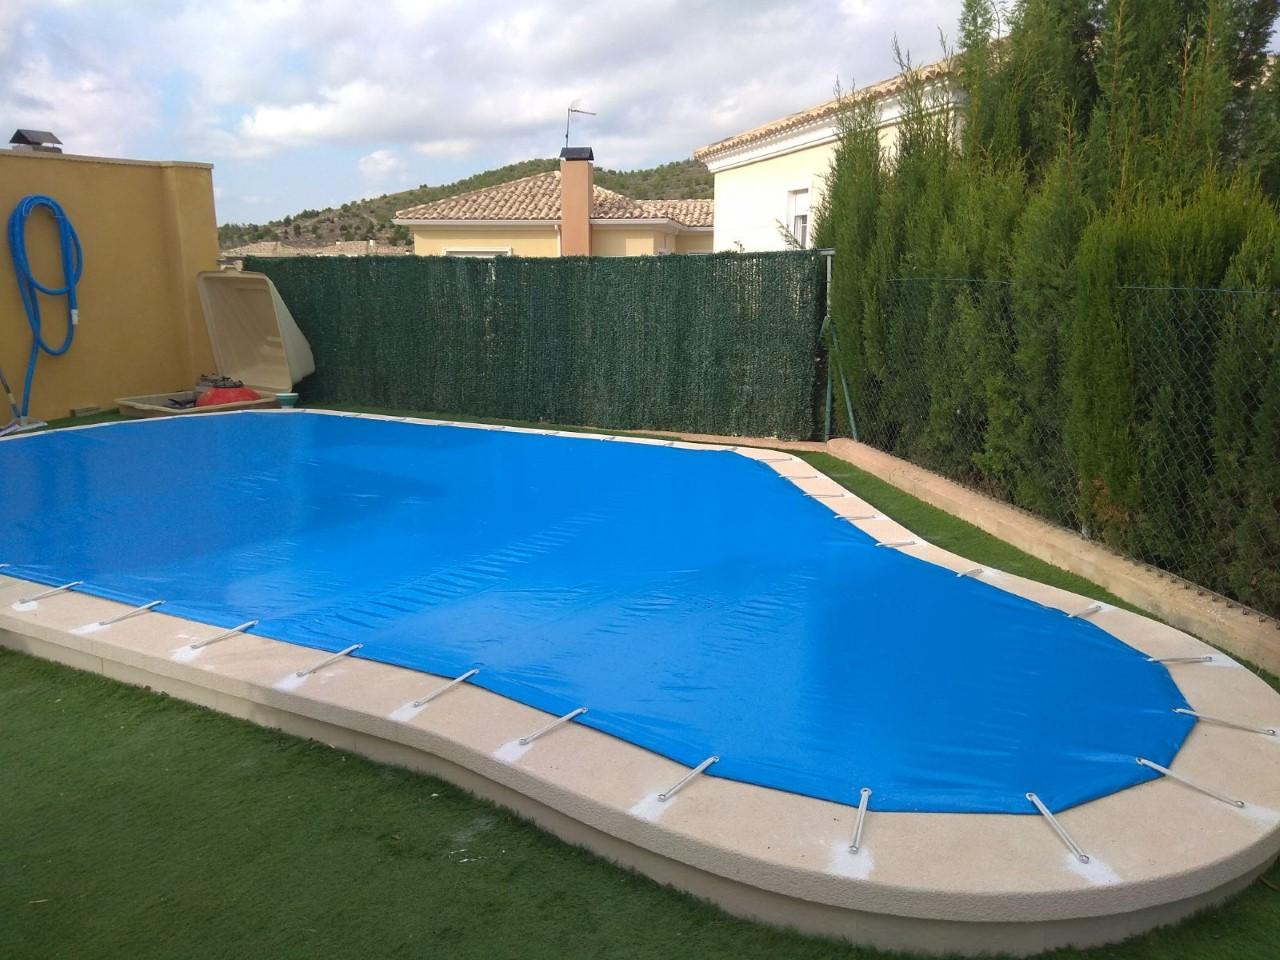 Lona de piscina for Lona interior piscina desmontable